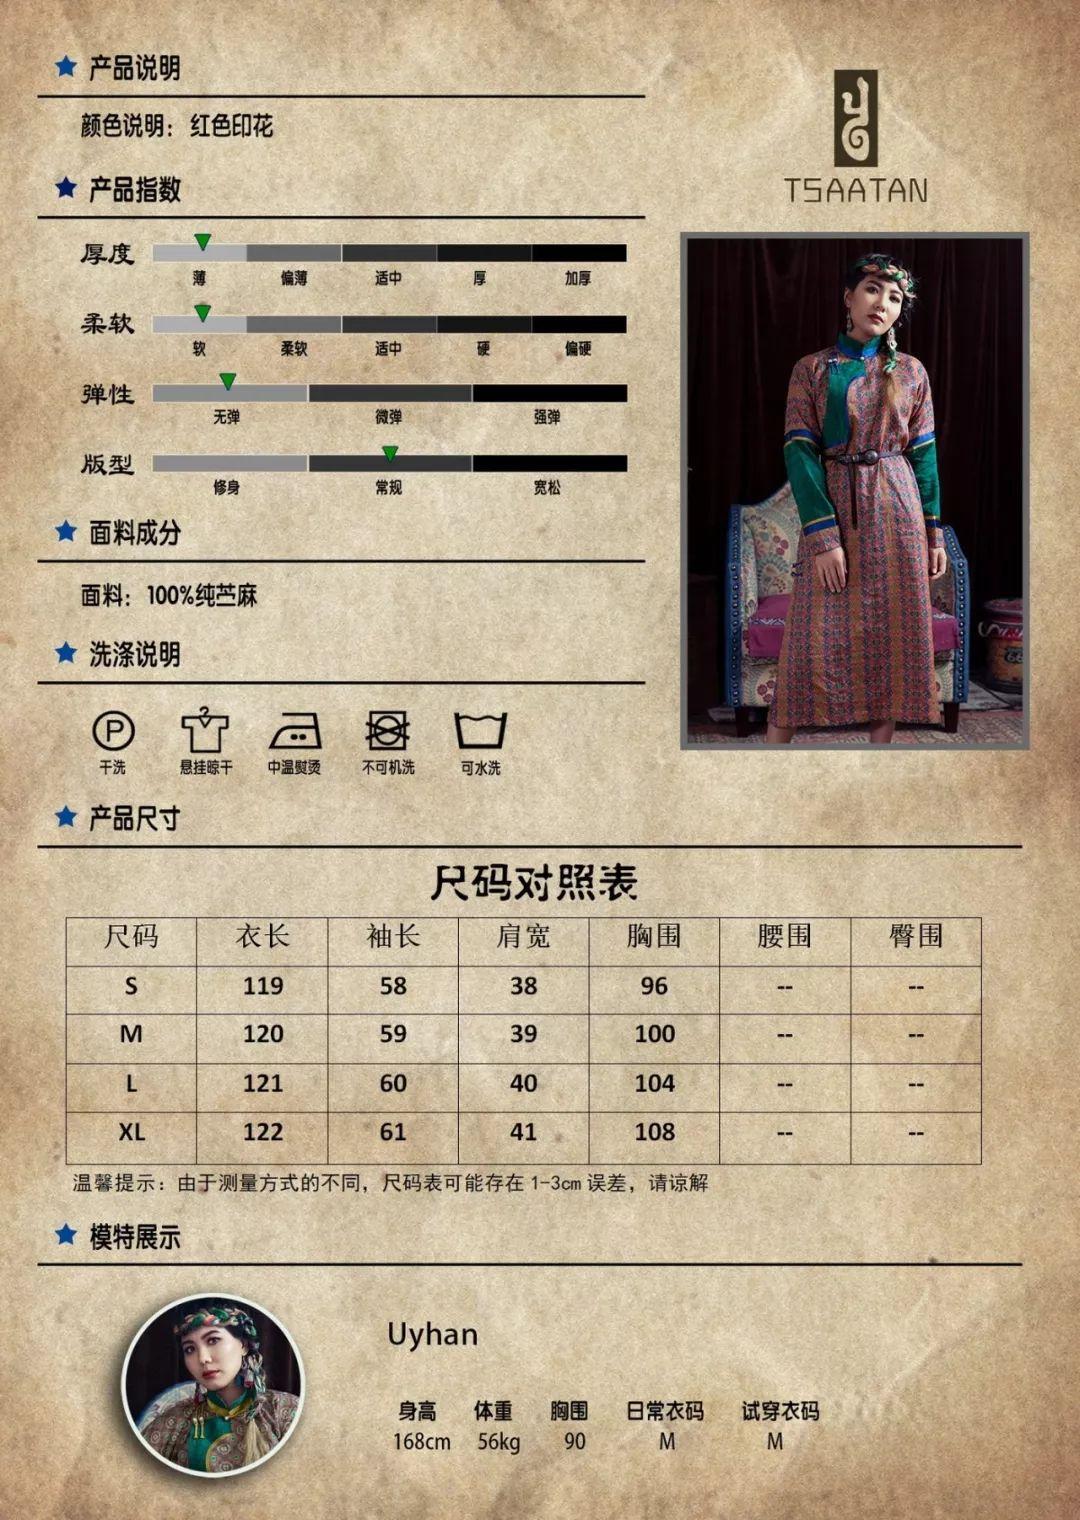 TSAATAN蒙古时装 2019夏季新款首发 第96张